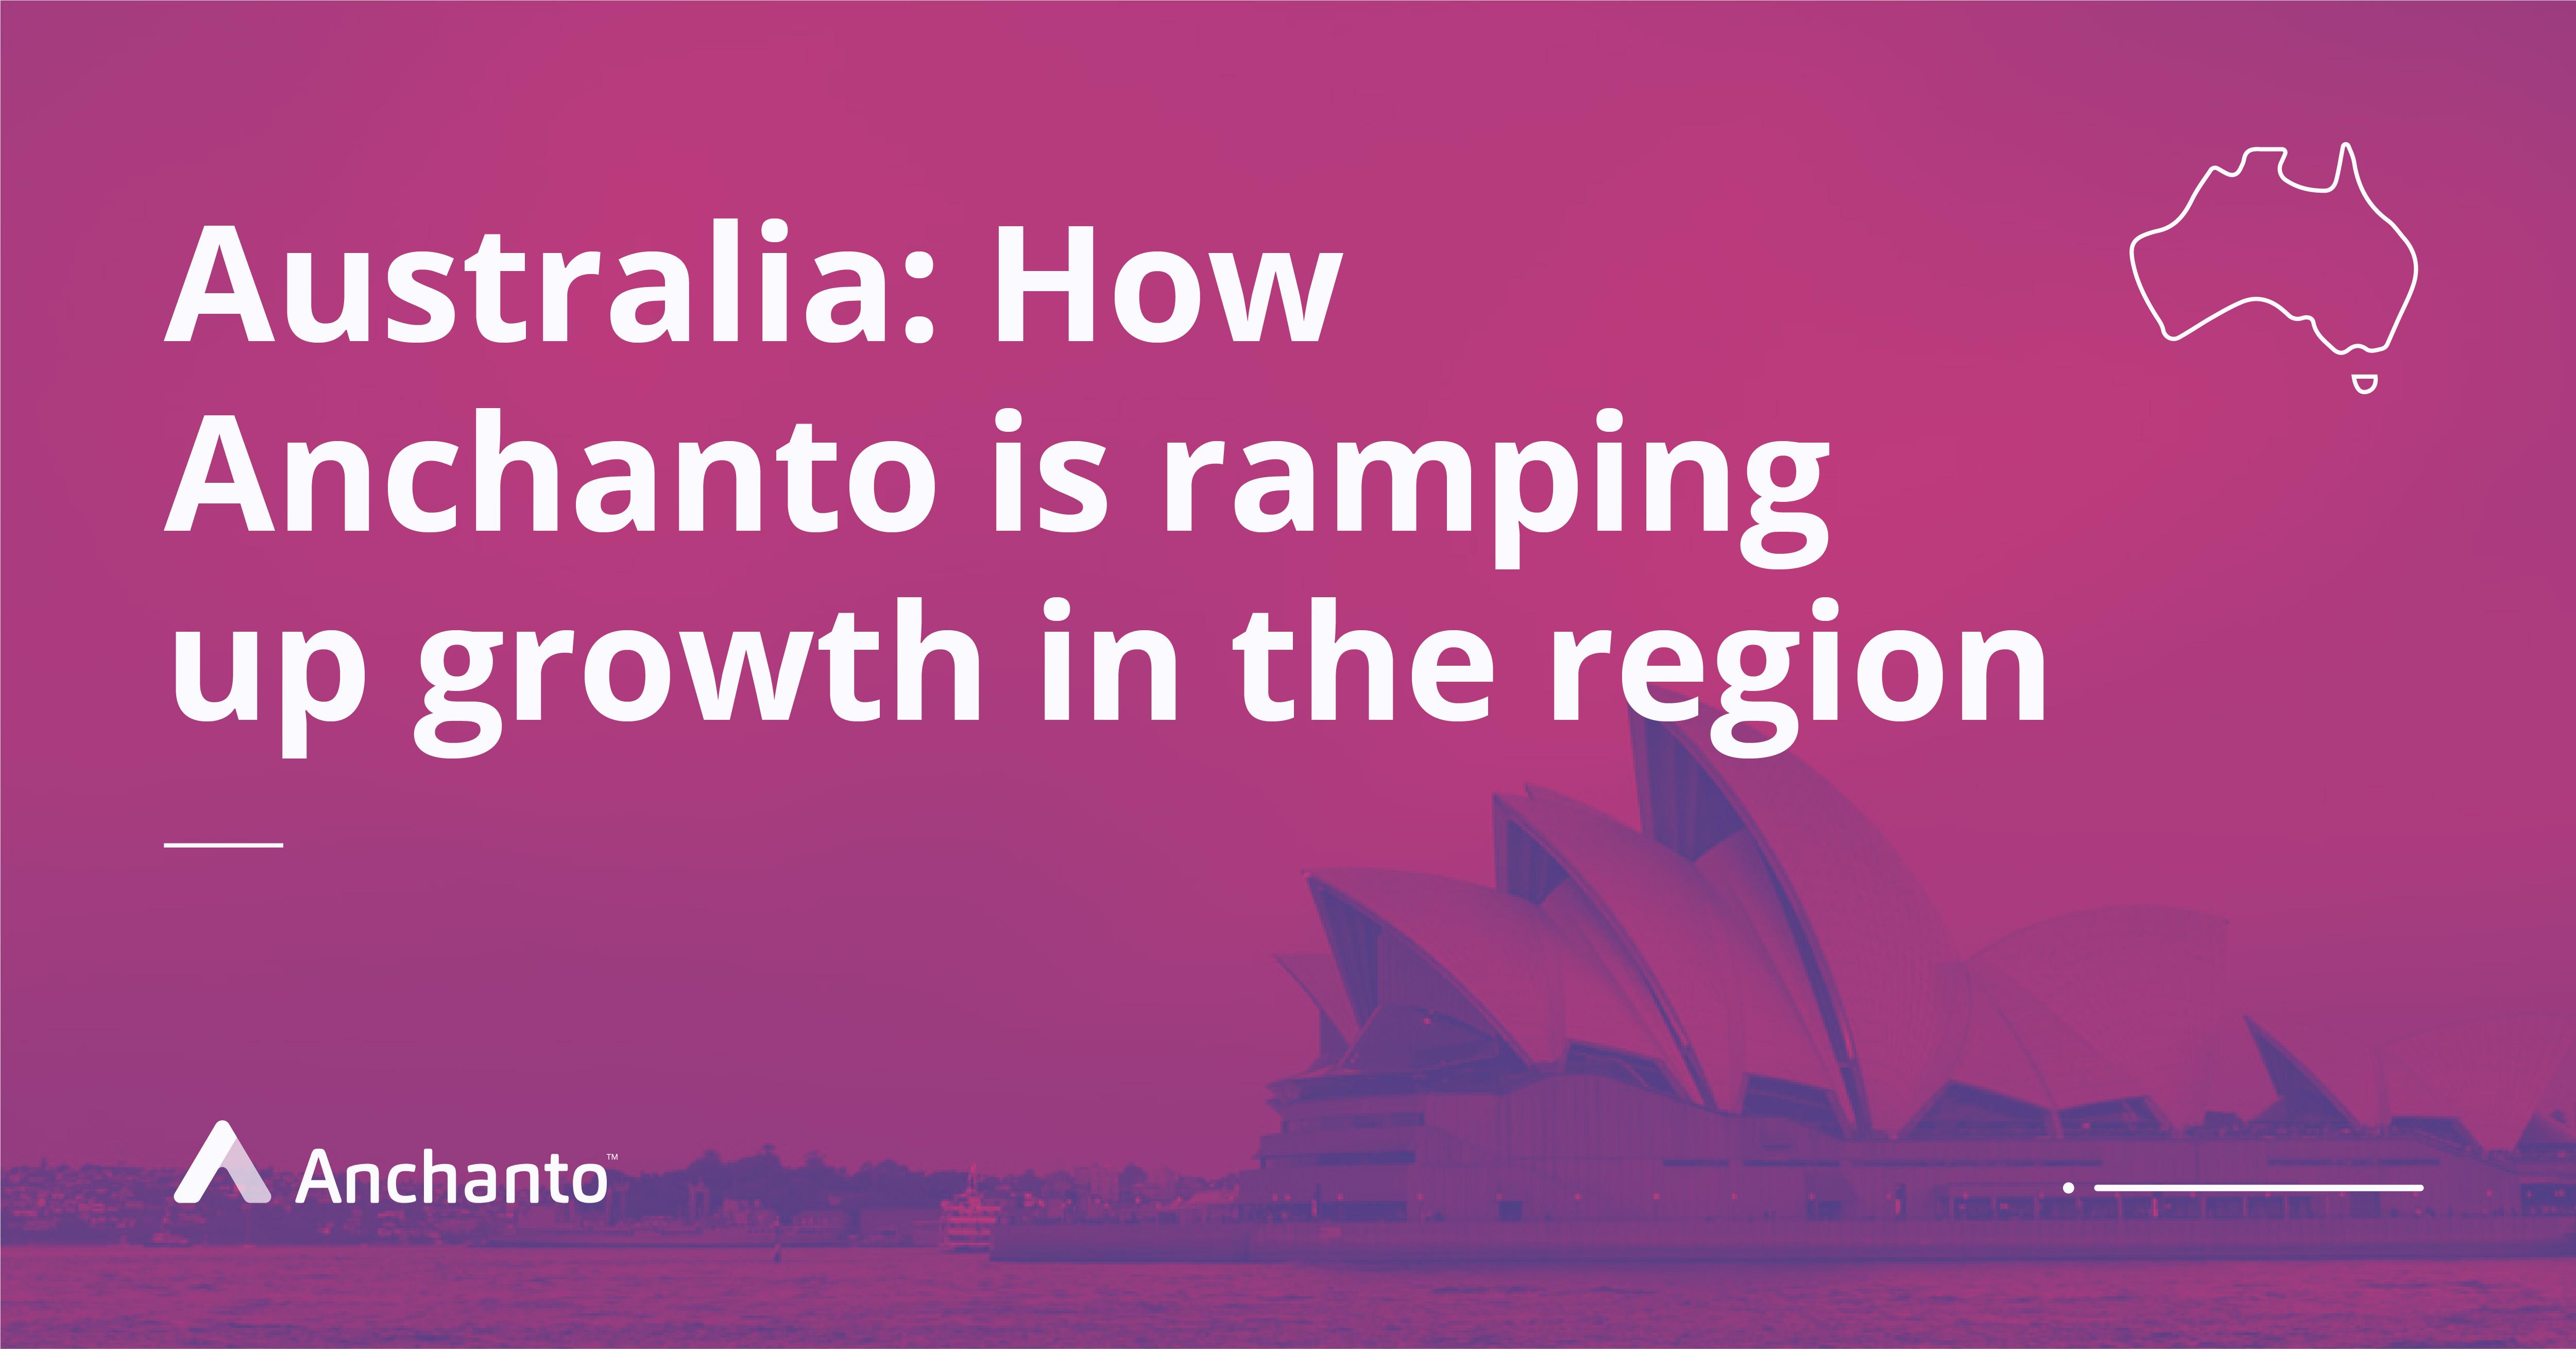 Anchanto in Australia